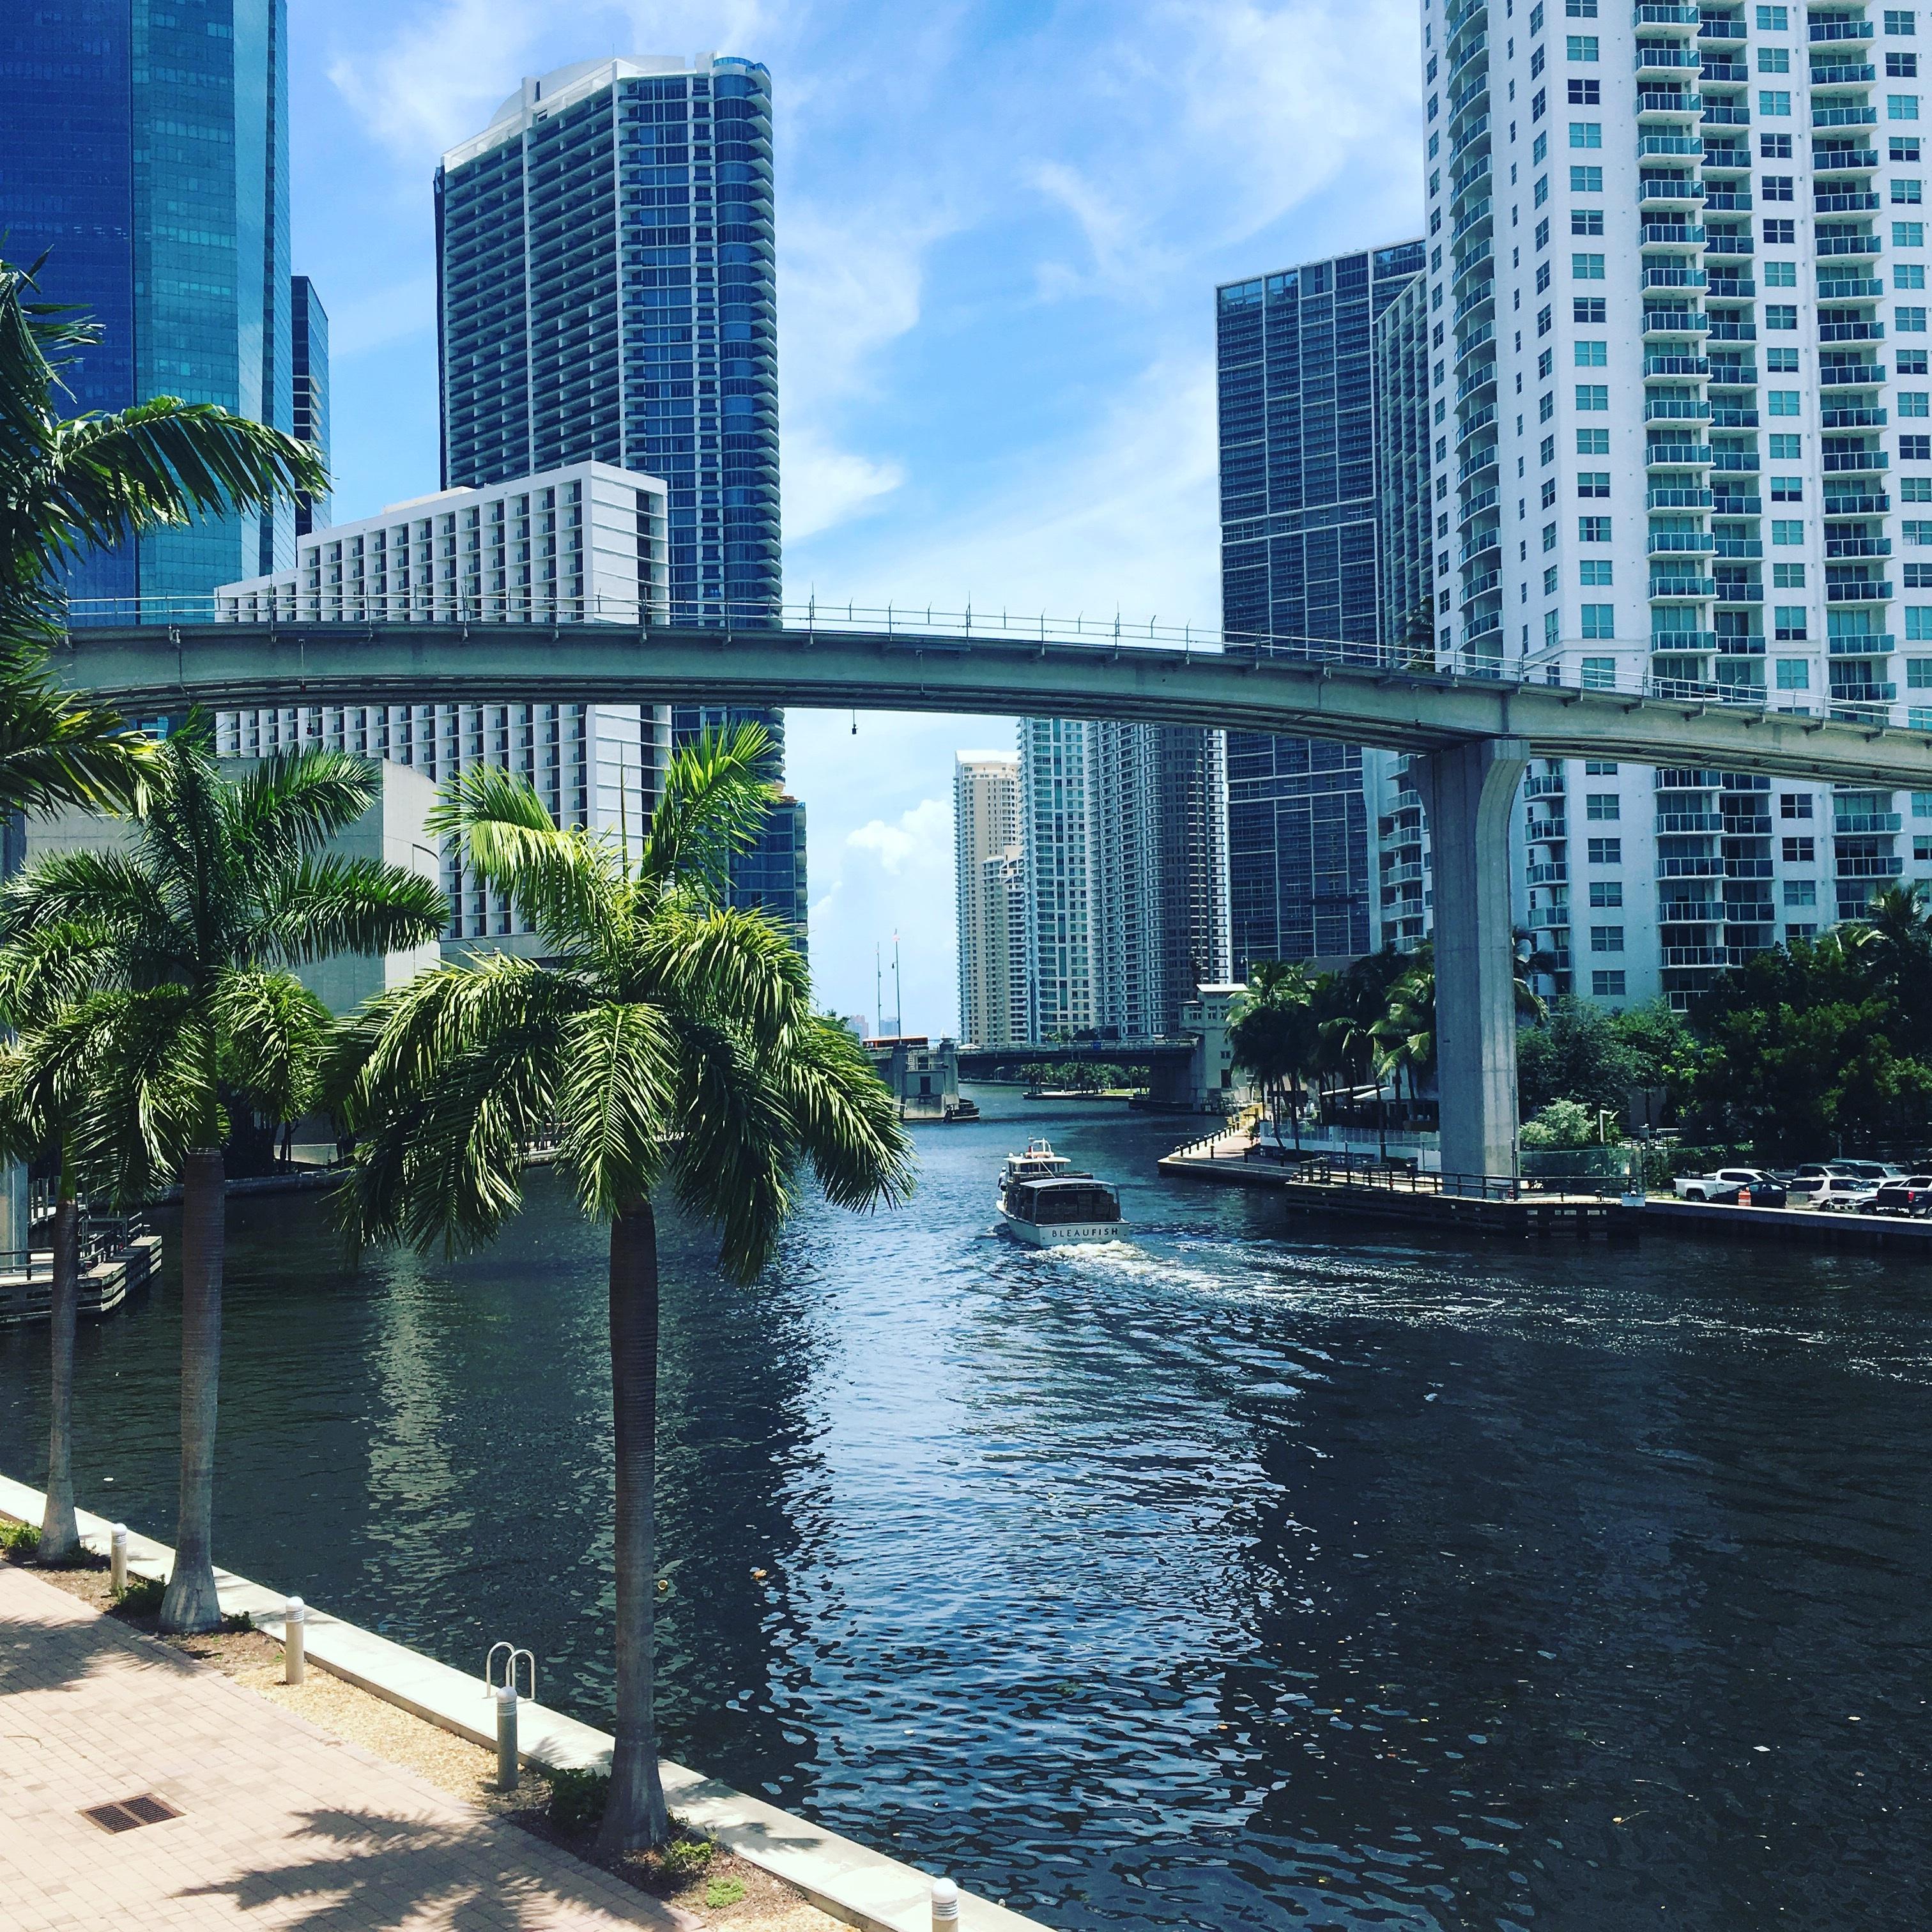 Gambar Dermaga Arsitektur Perahu Jembatan Kaki Langit